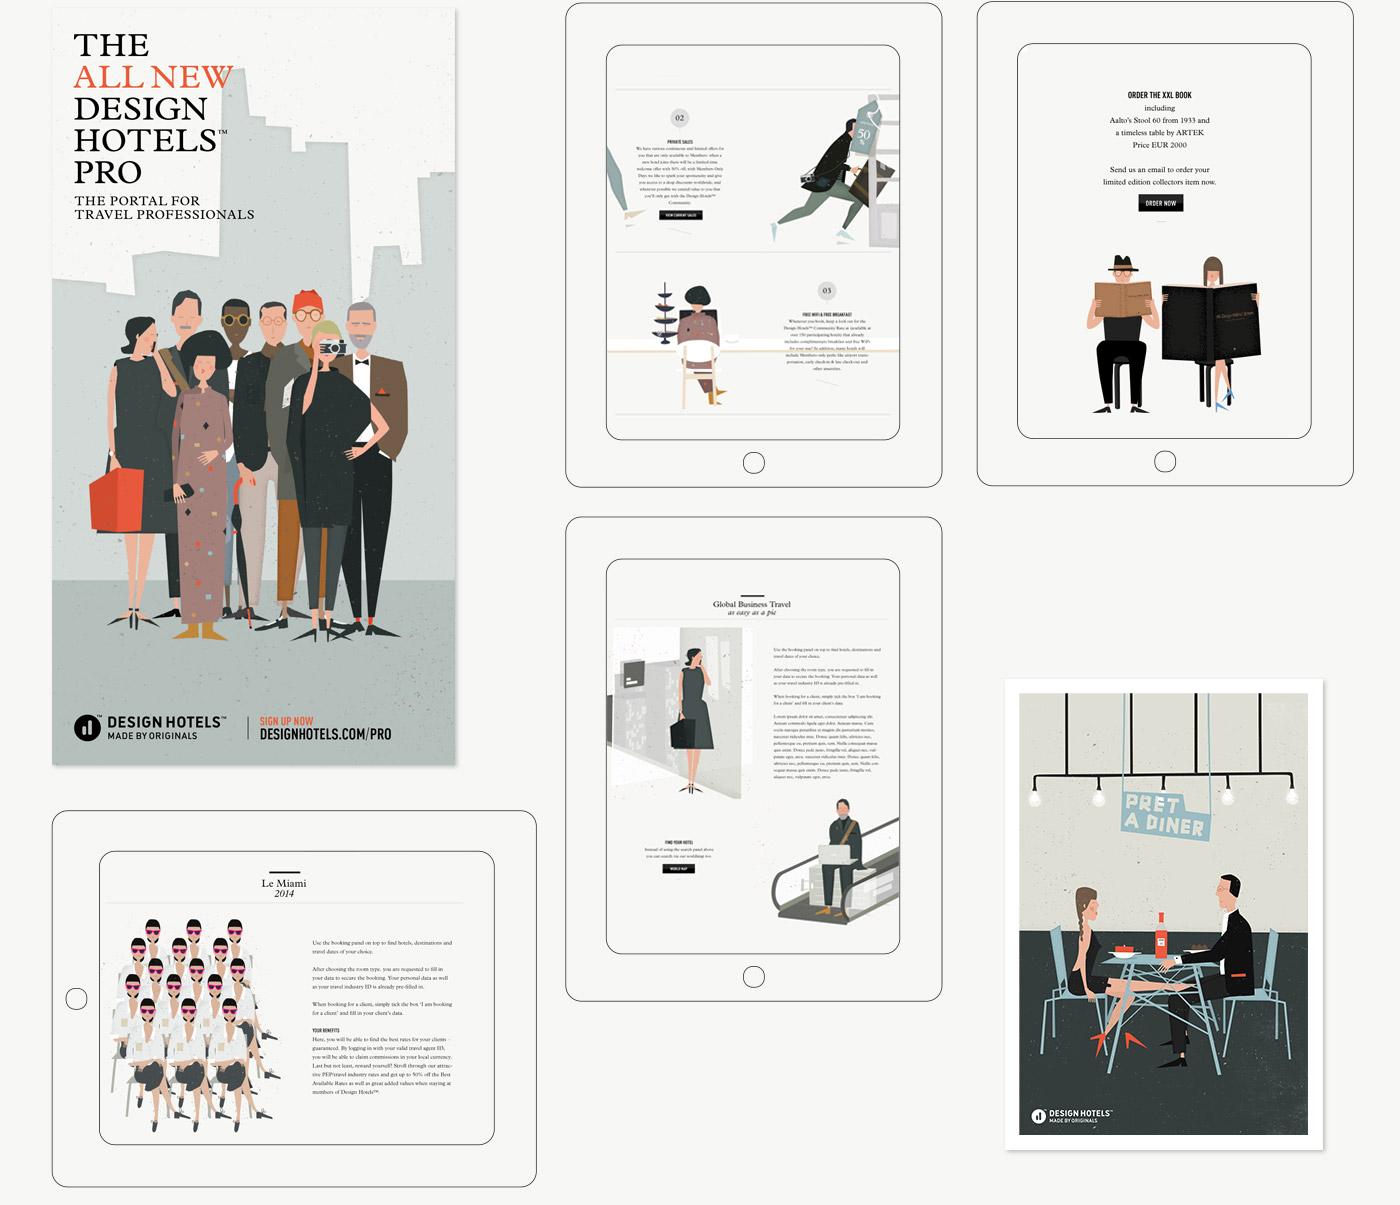 designhotels-community-illus-part1a